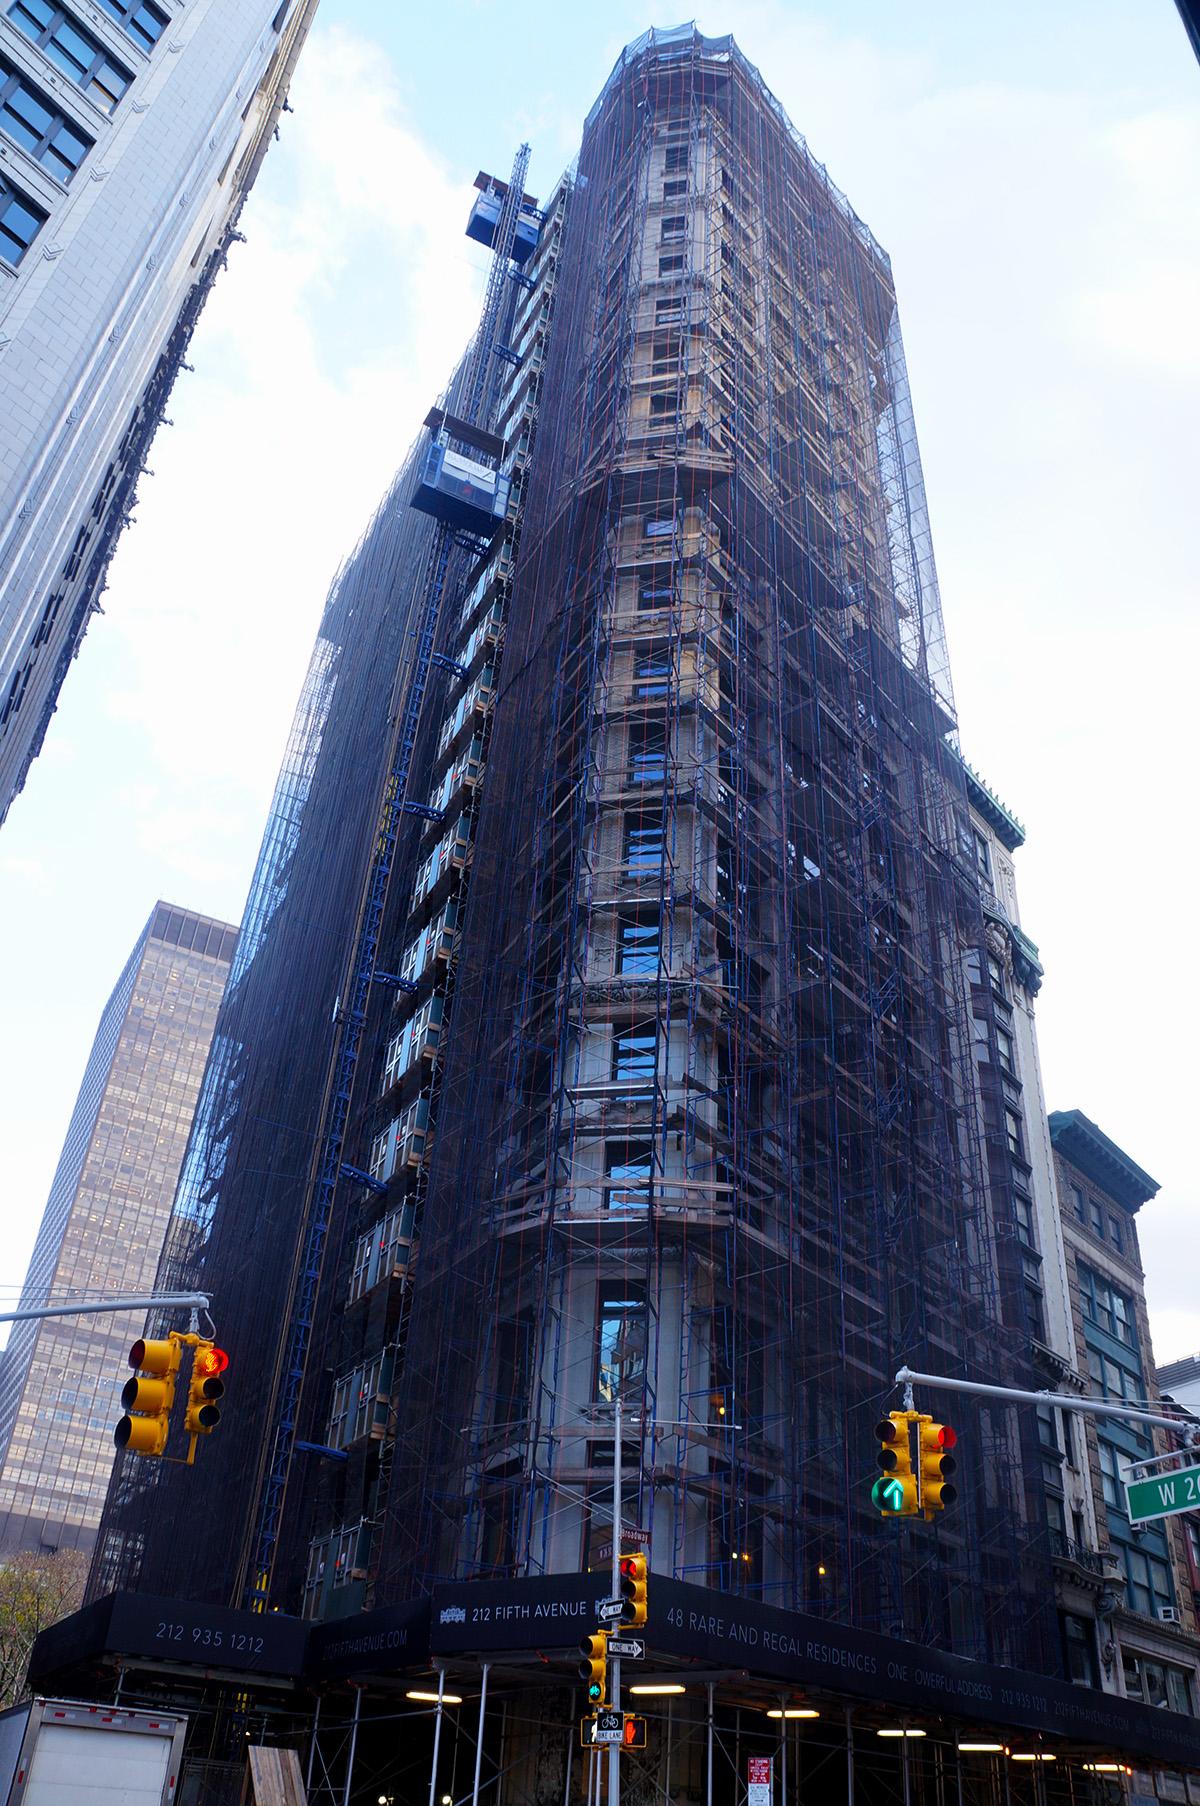 212 Fifth Avenue clad in scaffolding